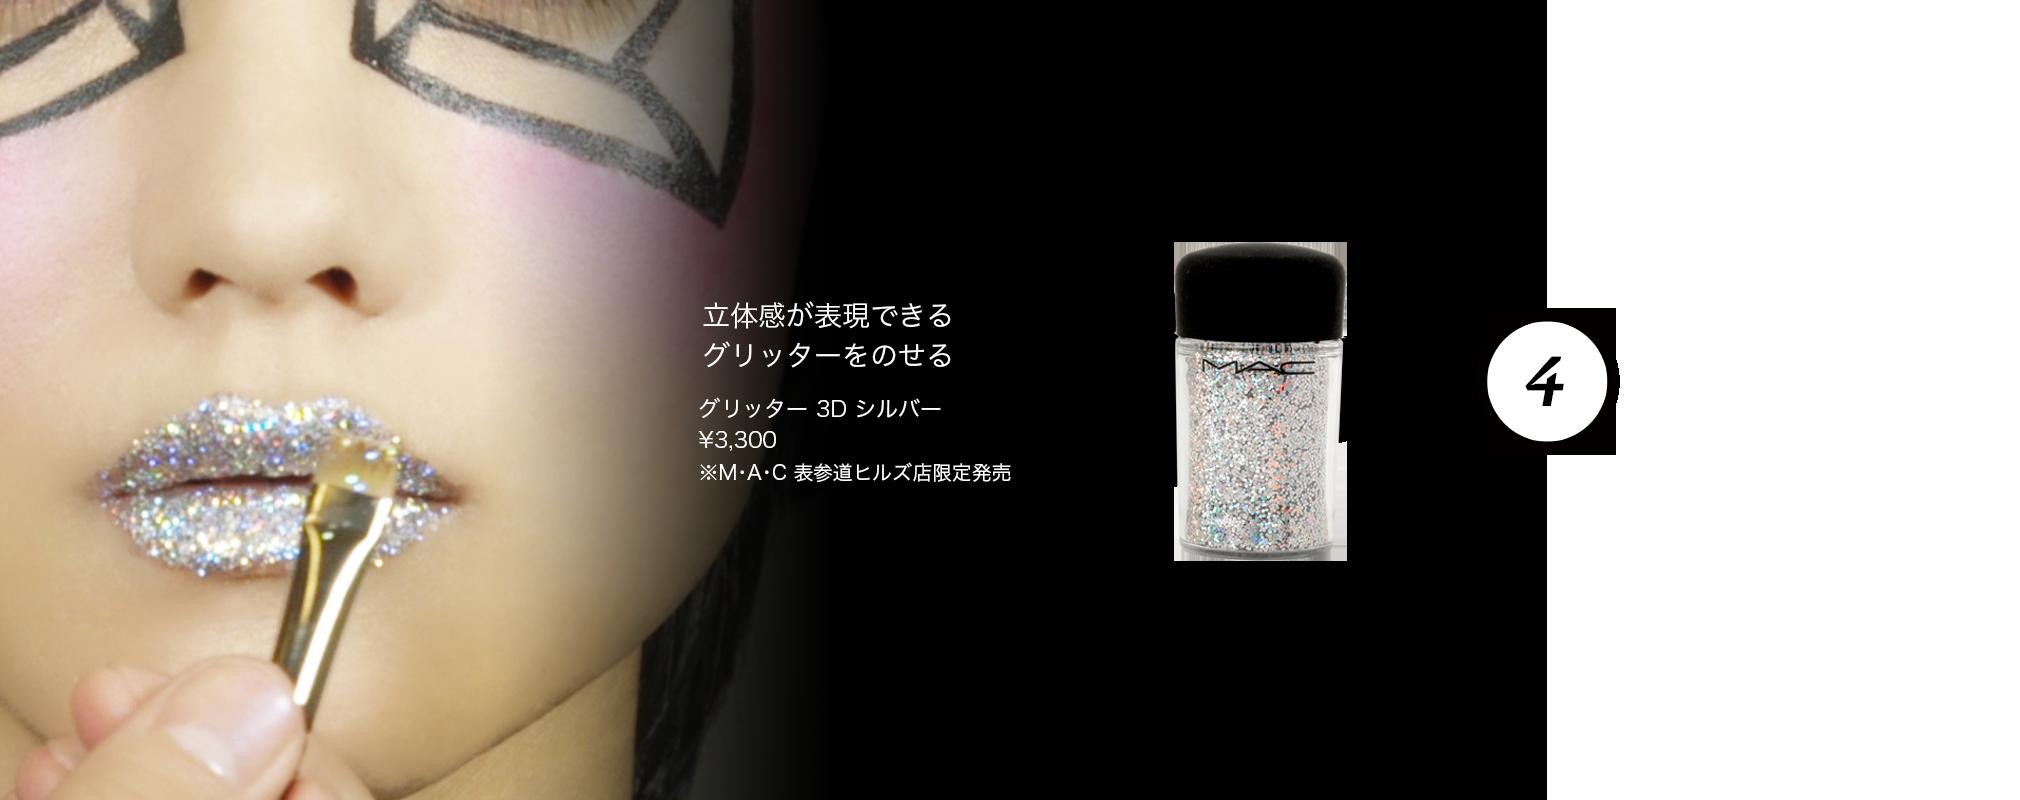 STEP4 グリッター 3D シルバー ¥3,300